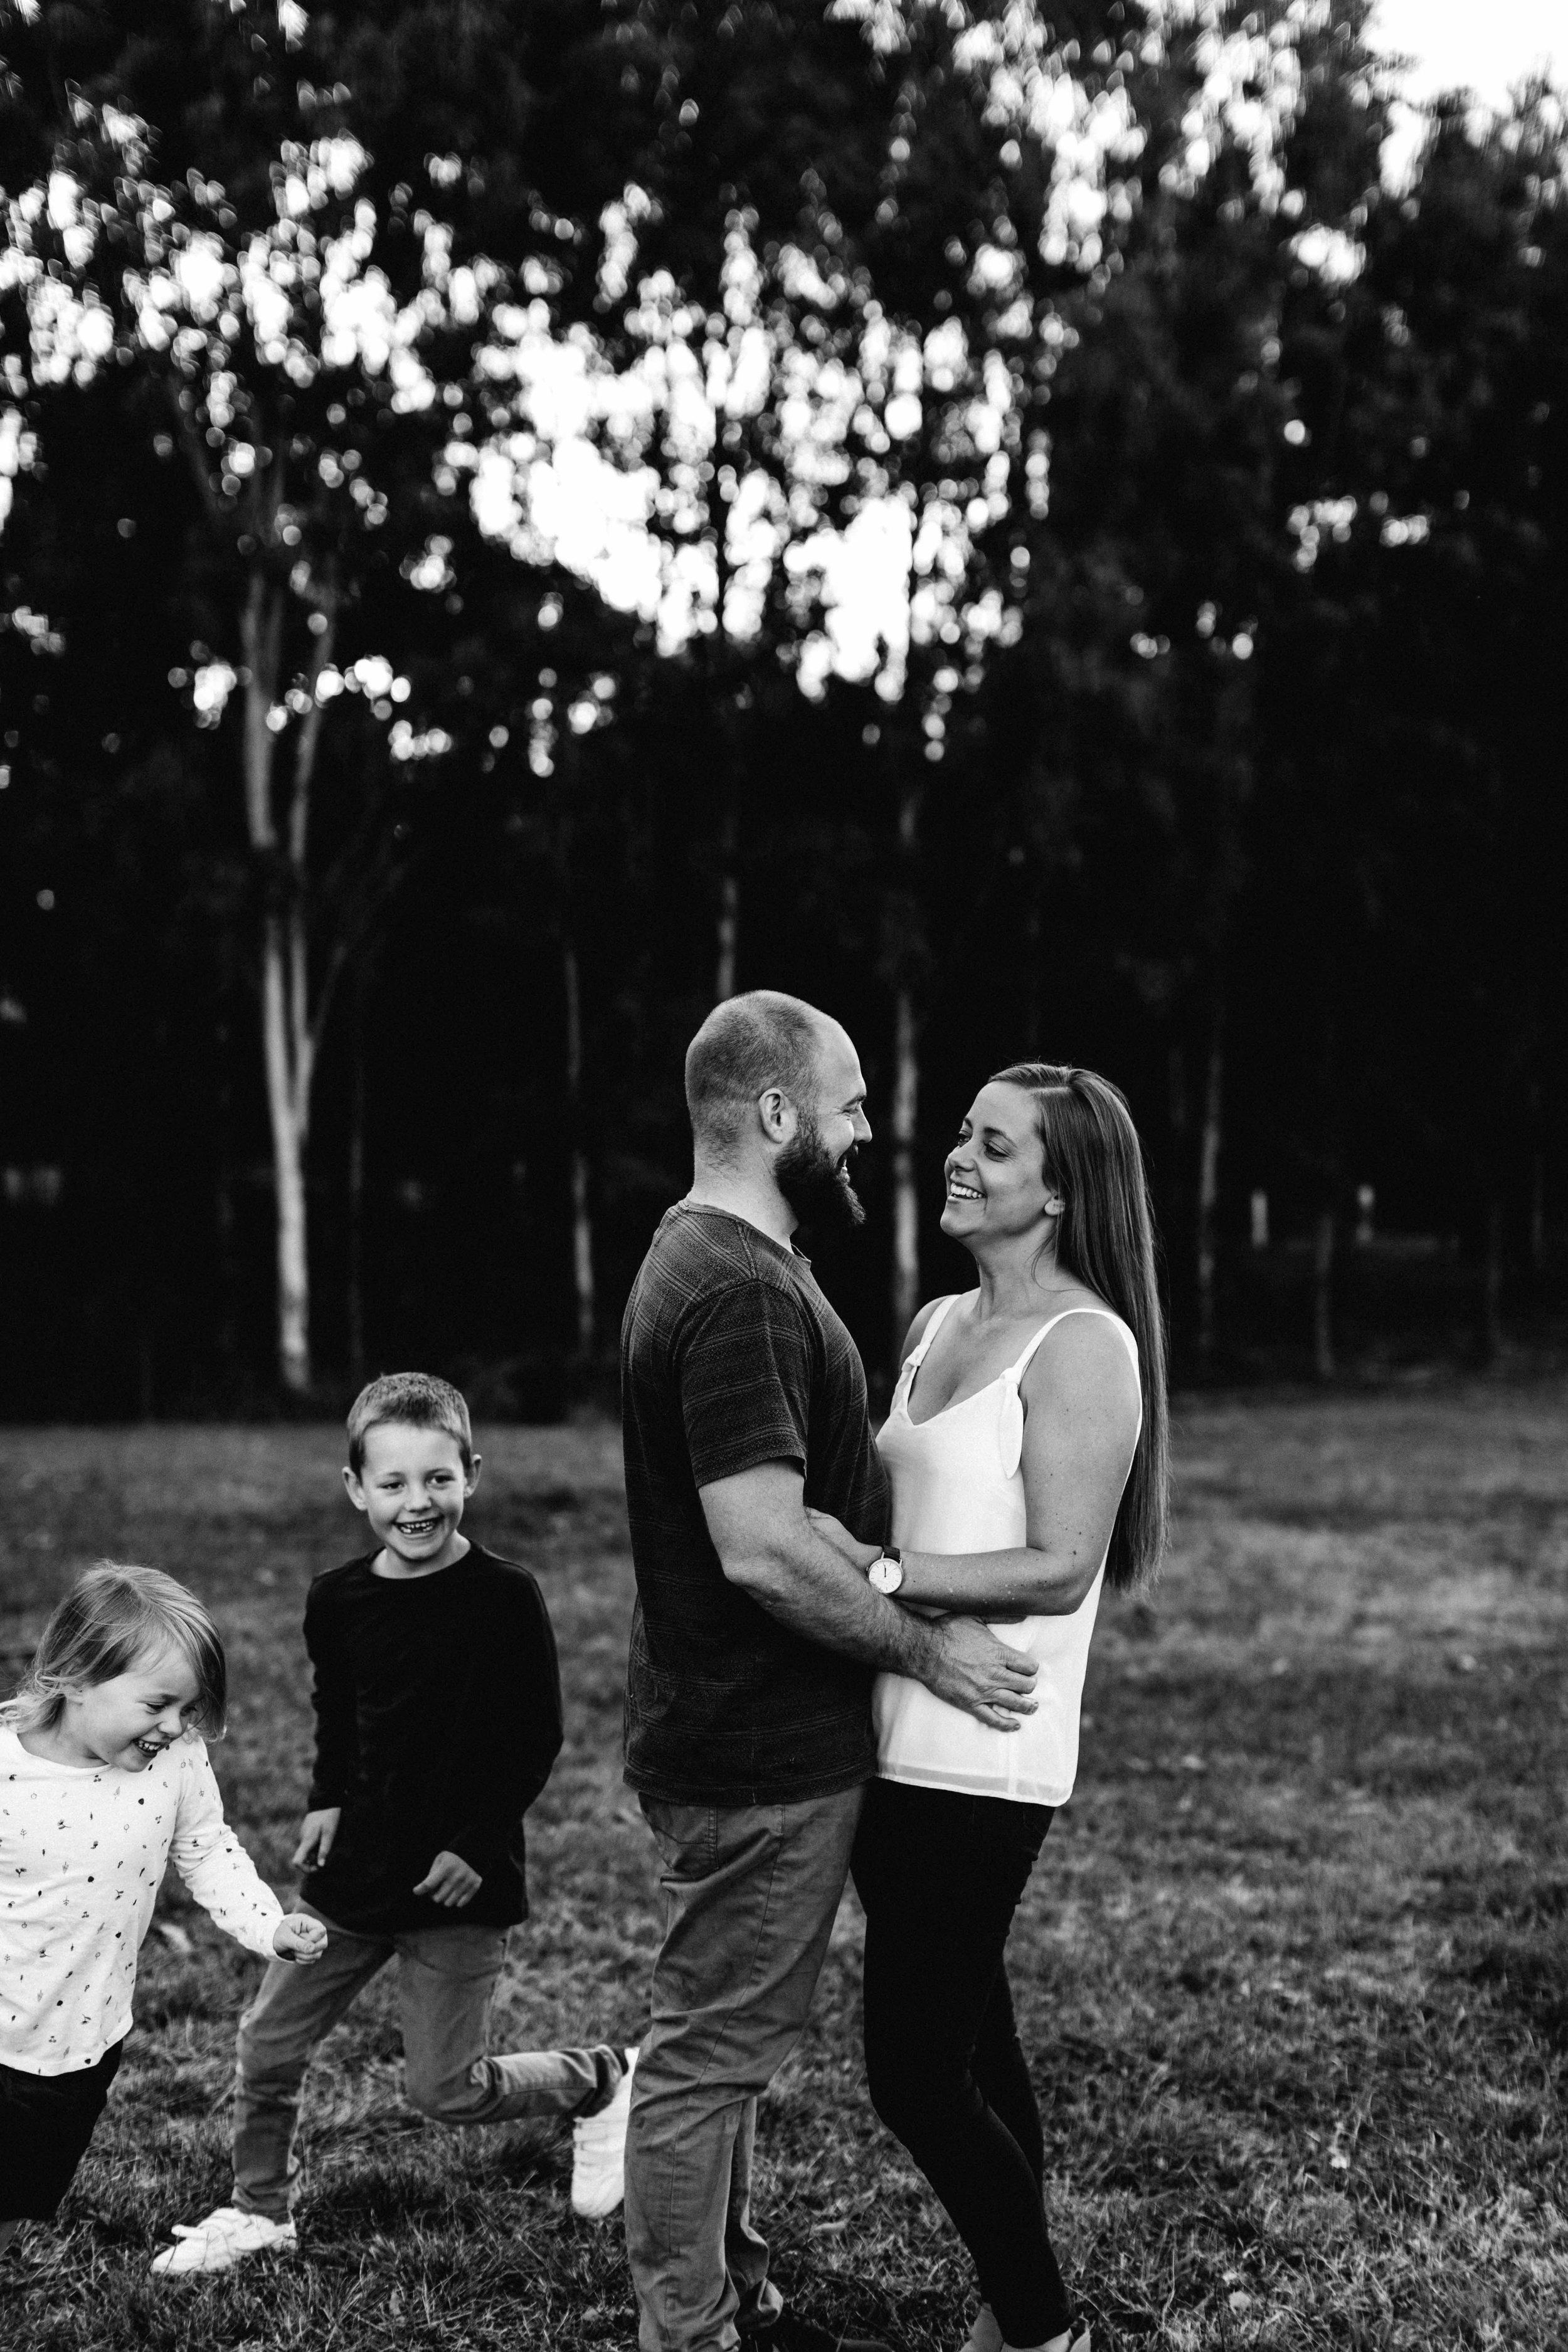 camden-family-photography-boot-family-session-31.jpg